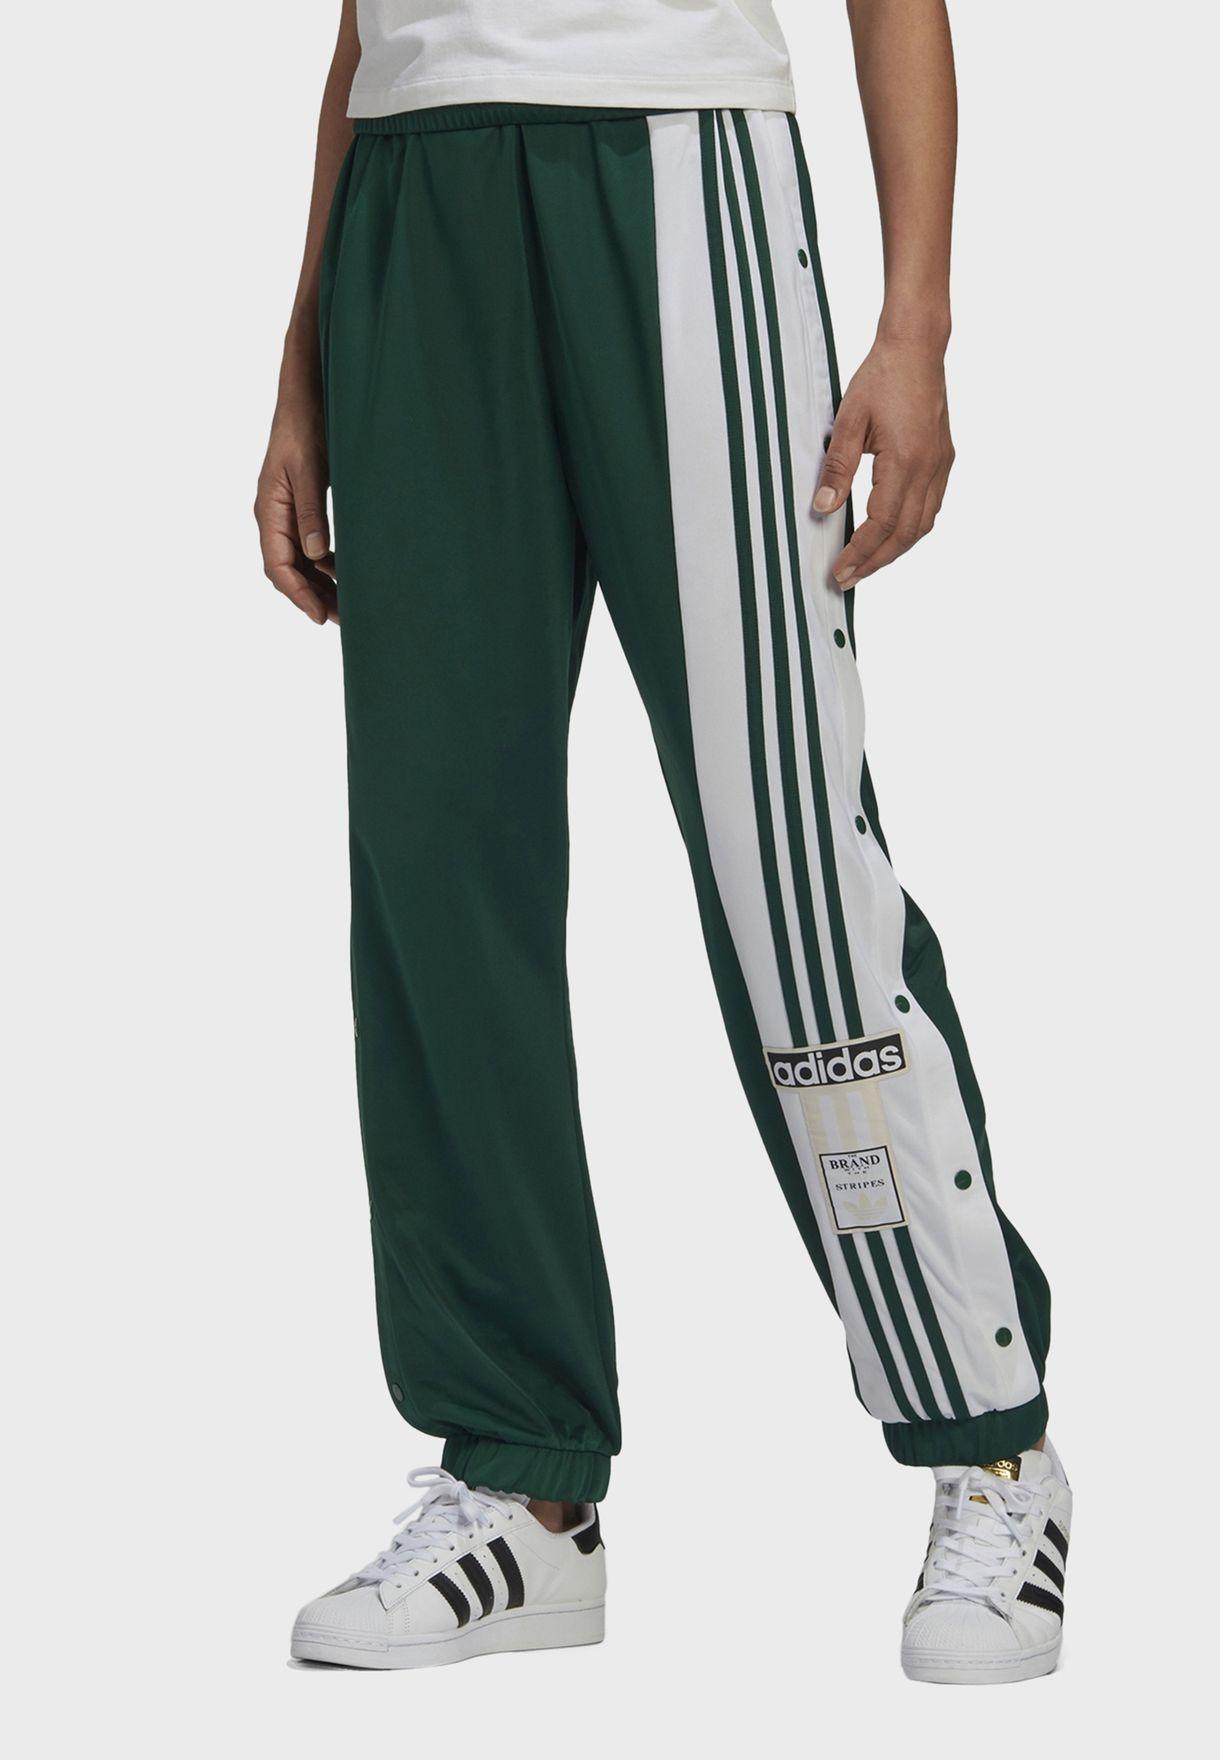 Adibreak Sweatpants